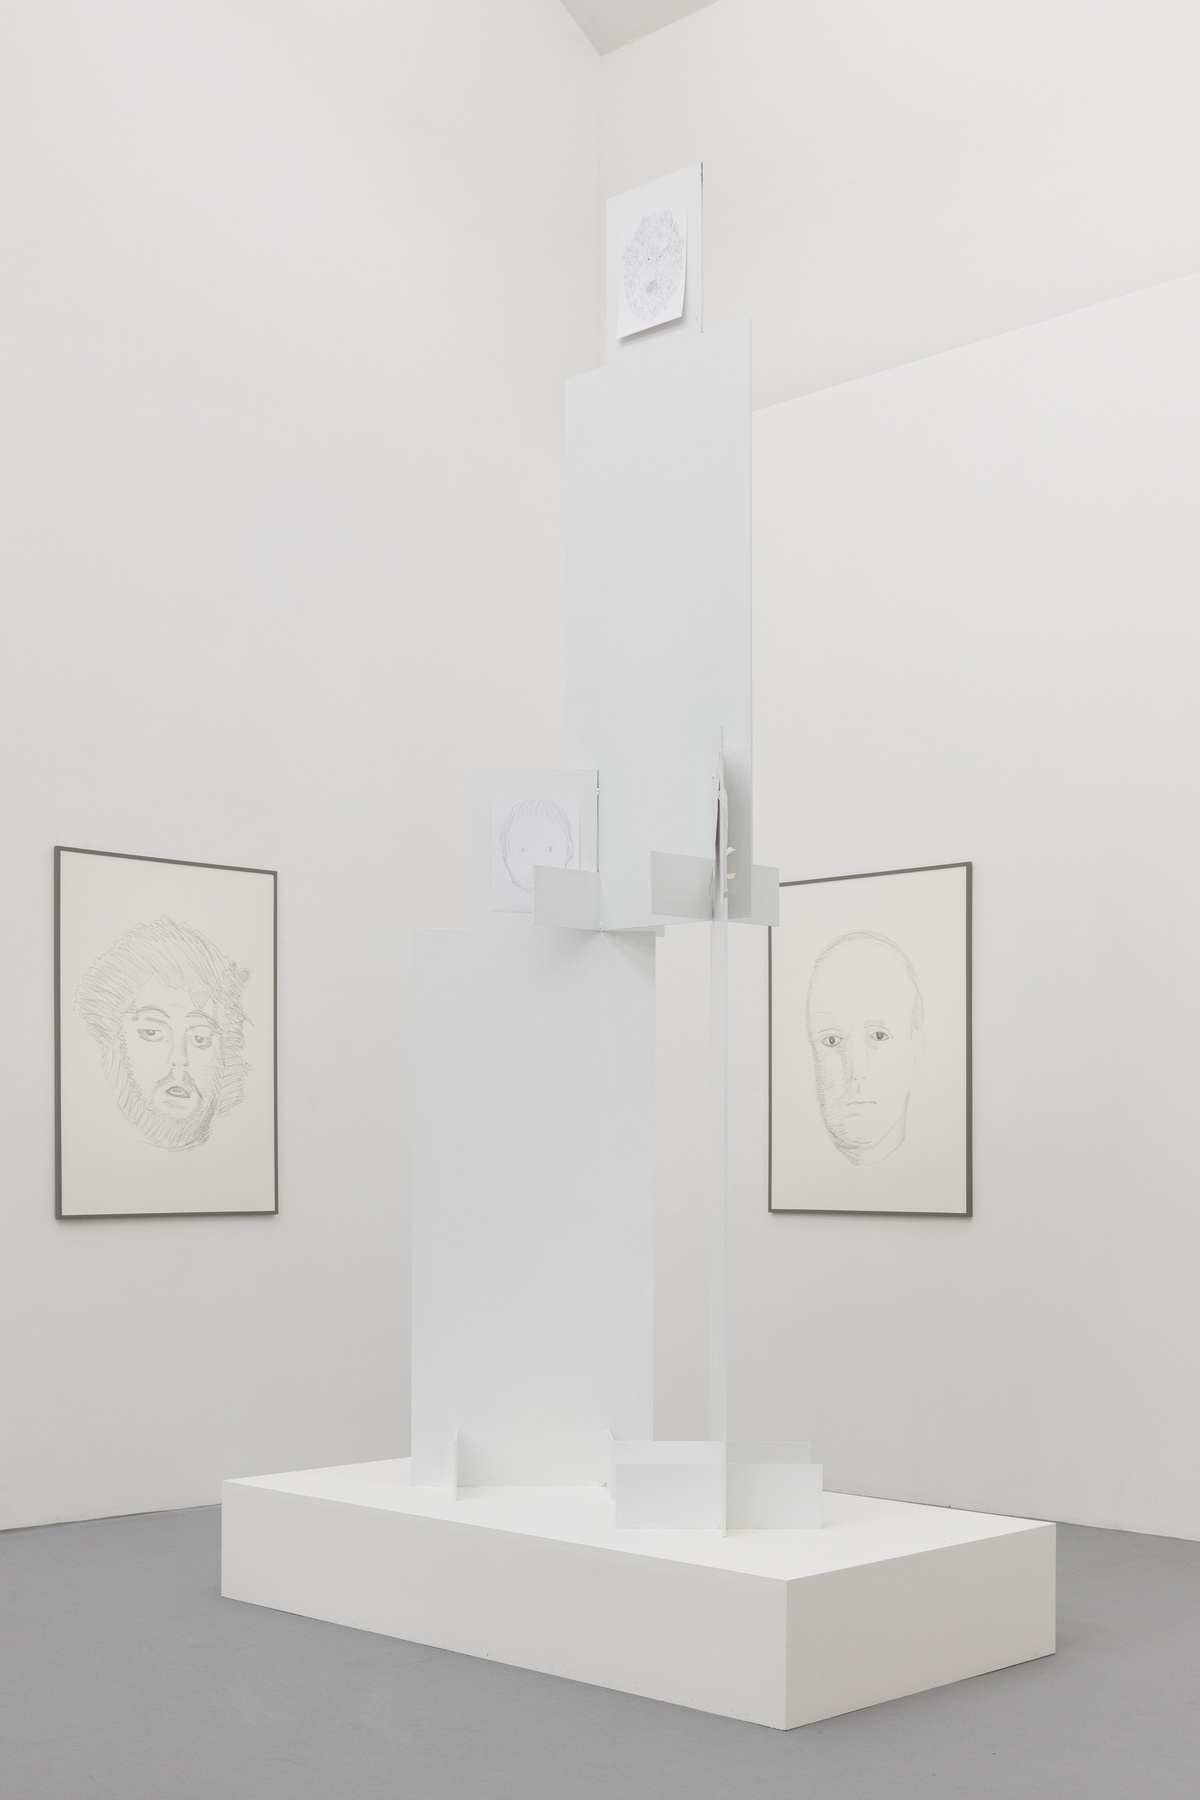 ┬® Gianluca Di Ioia - La Triennale-9